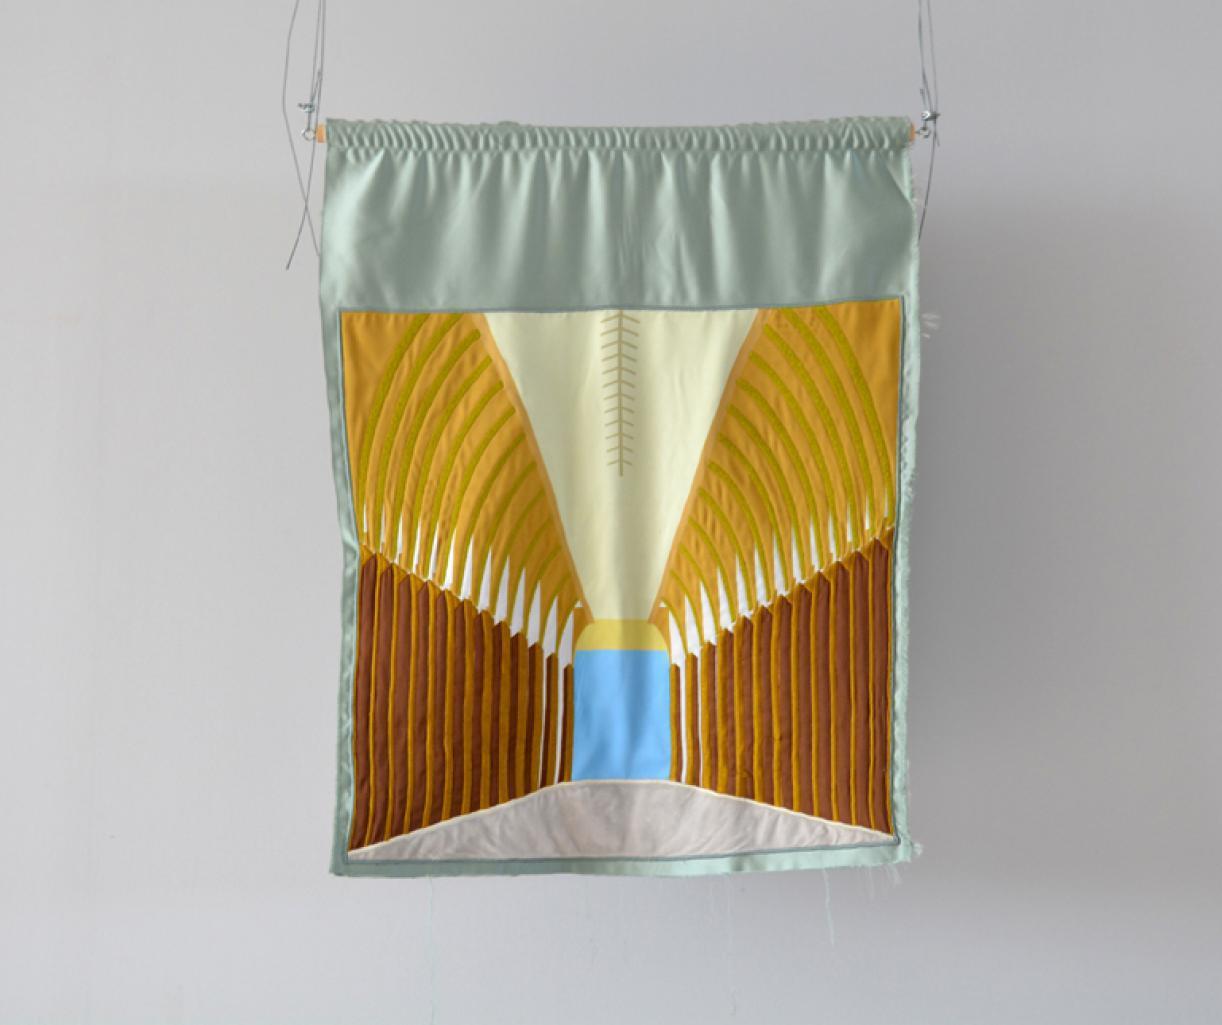 Blazon: Majidiyeh, Souk El Tawileh, 2015, Embroidery and applique on textile, 85 x 64 cm, Ed. 3 + 2 AP